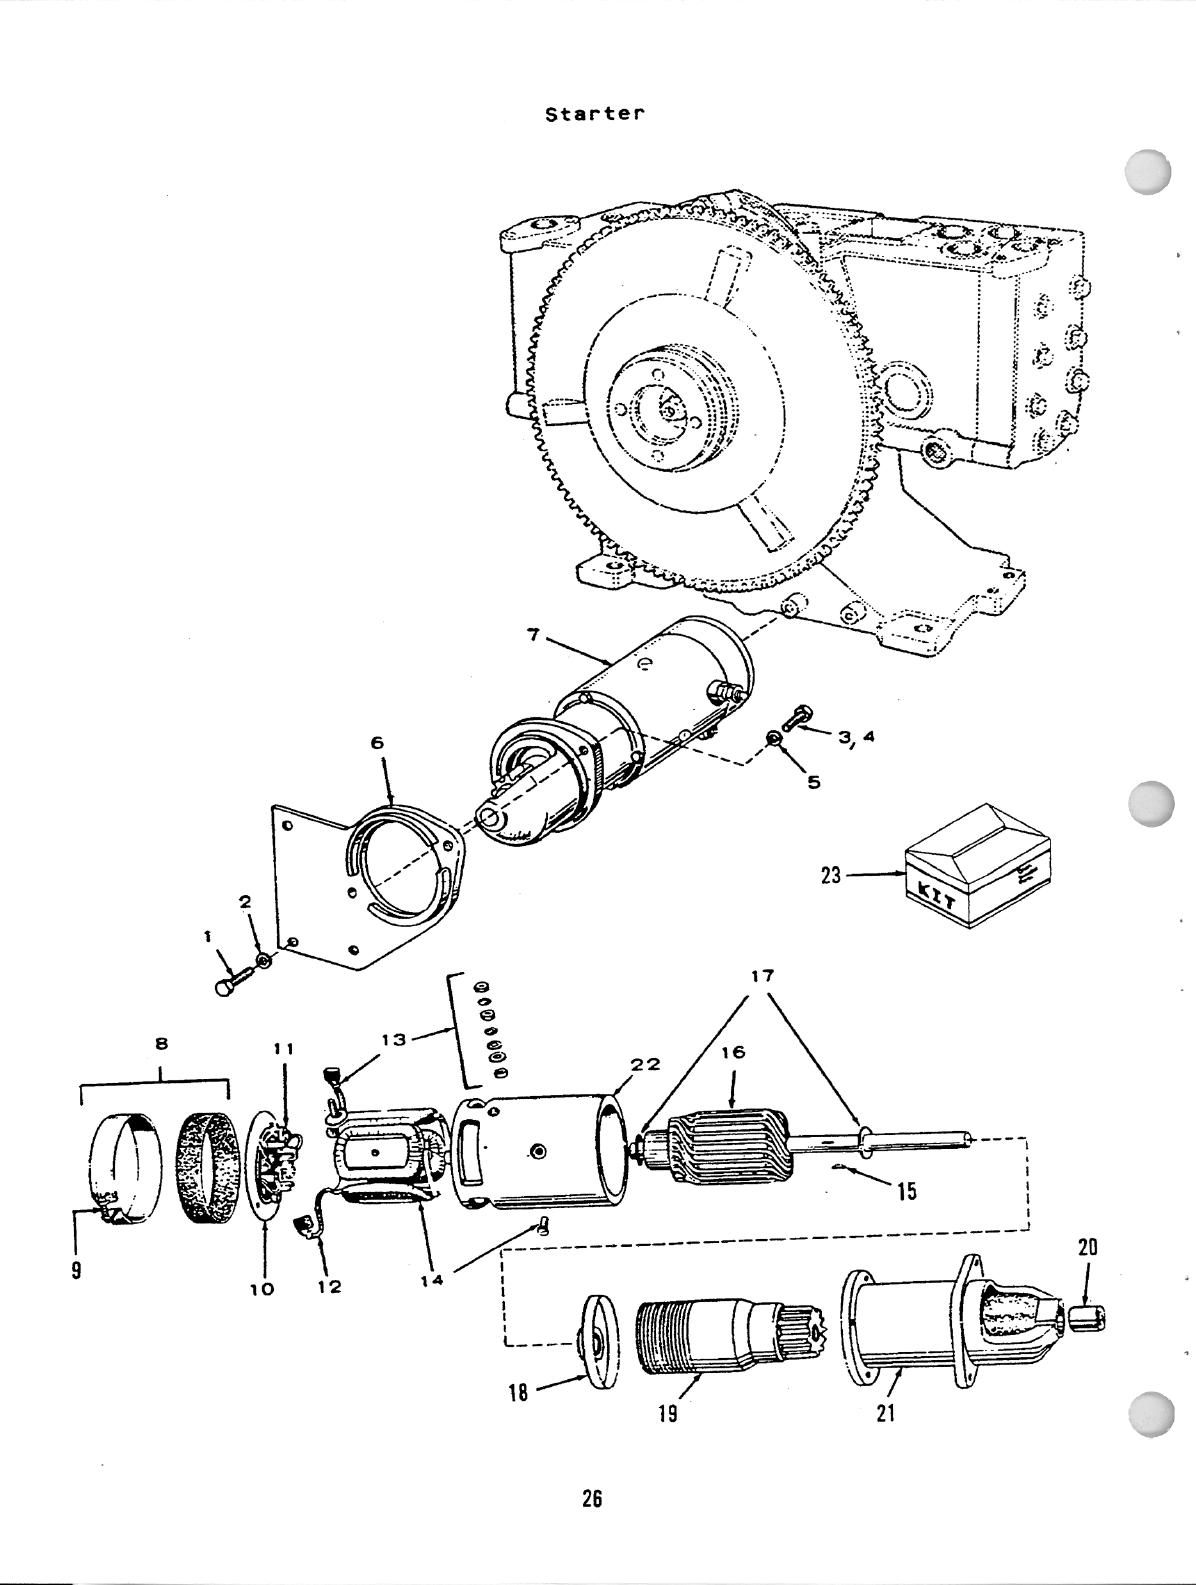 Wiring Diagrams And Free Manual Ebooks Classic Honda C200 Wiring